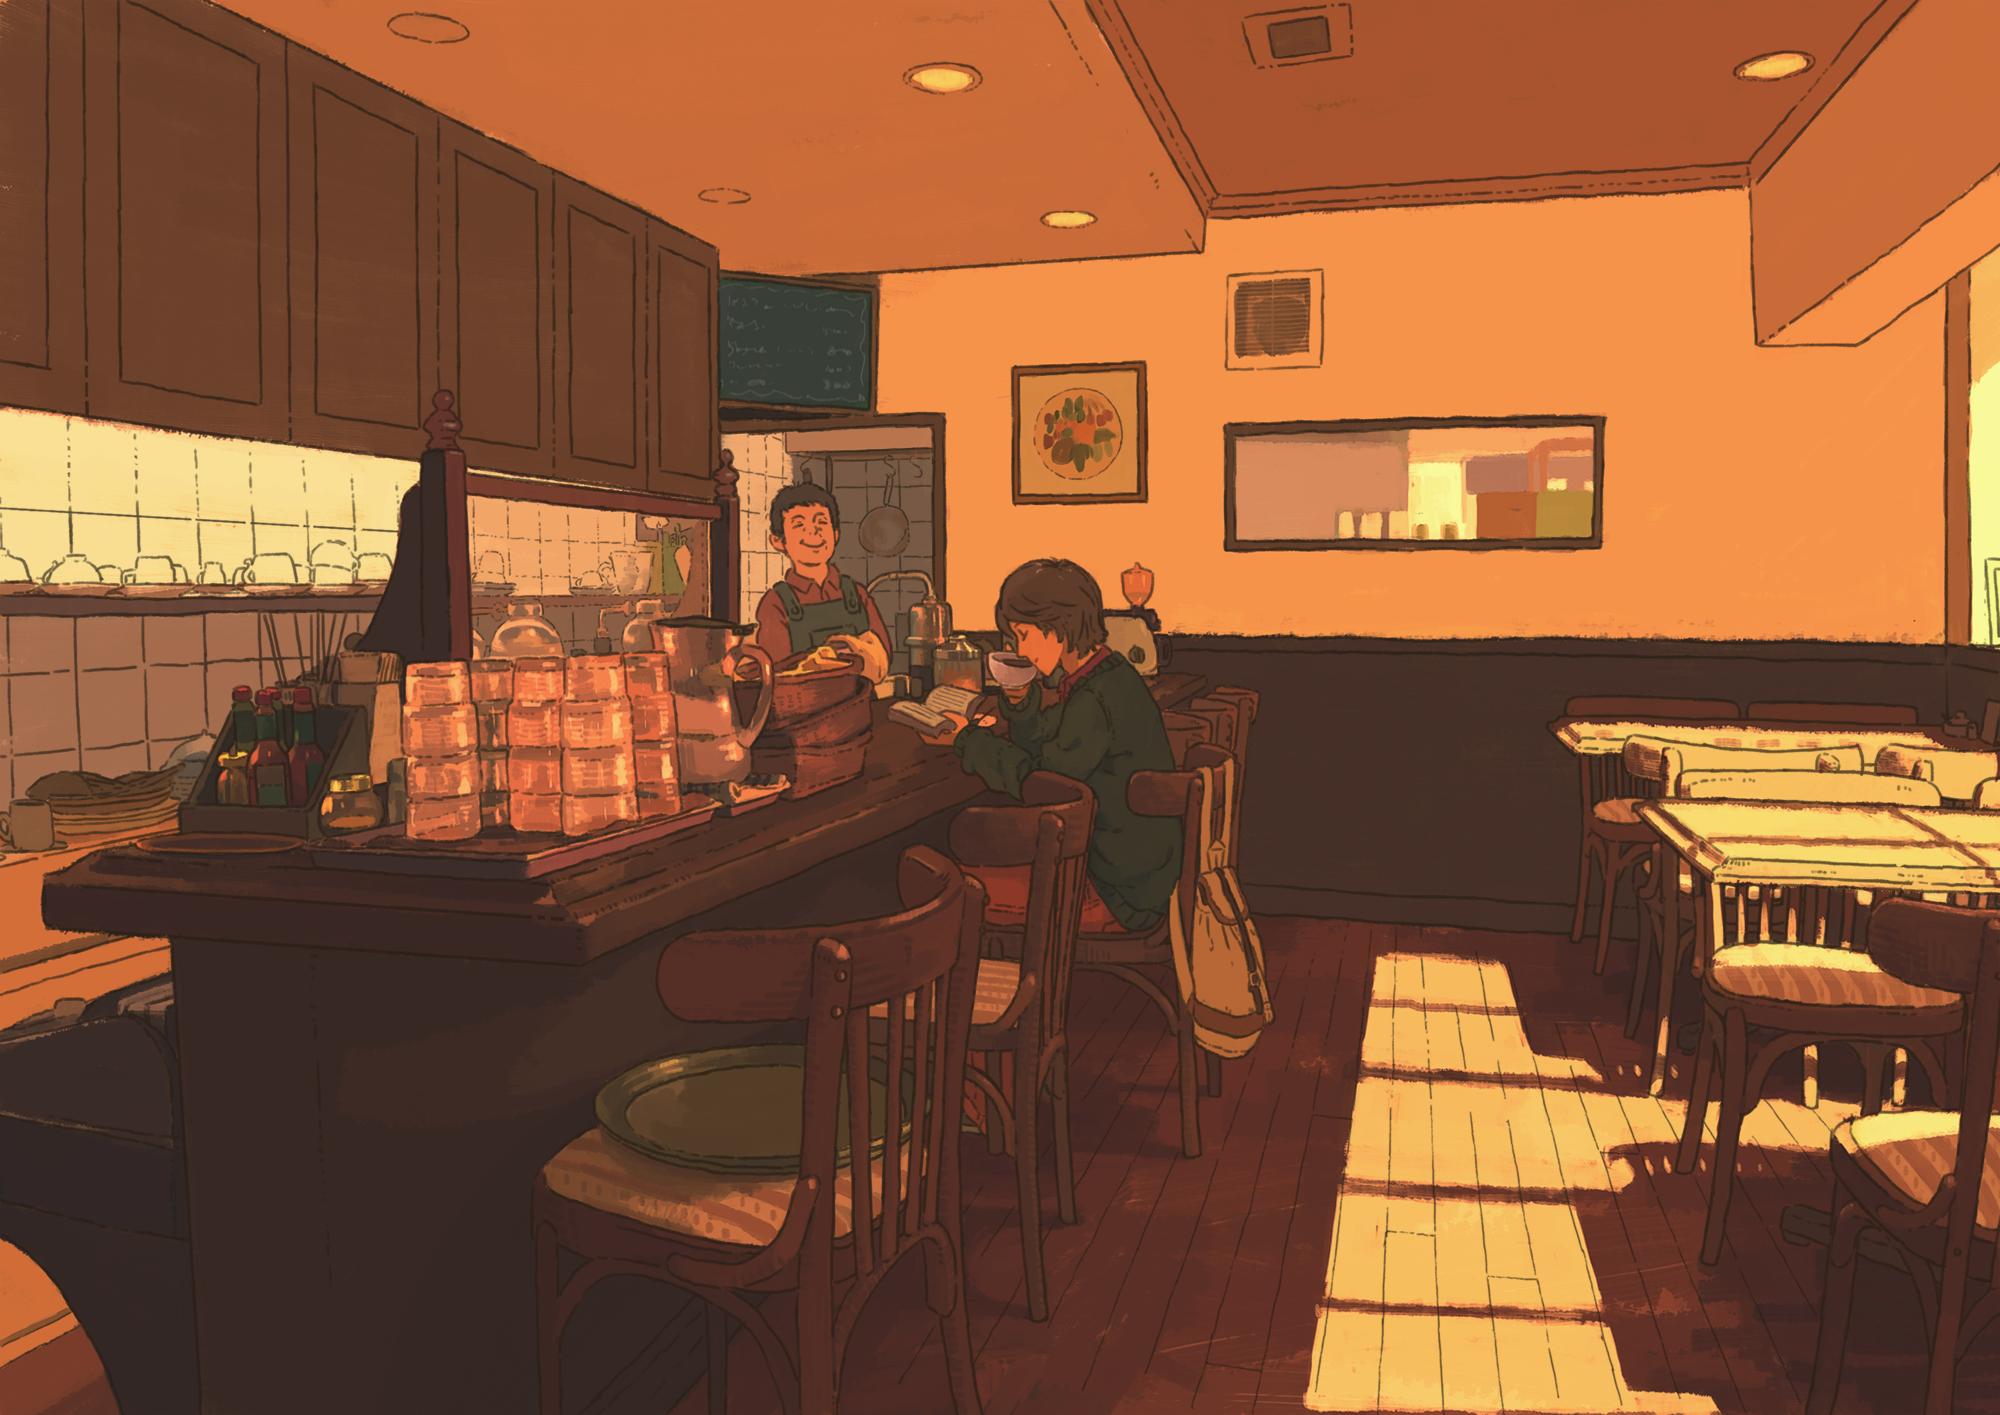 Anime Restaurant Papirio